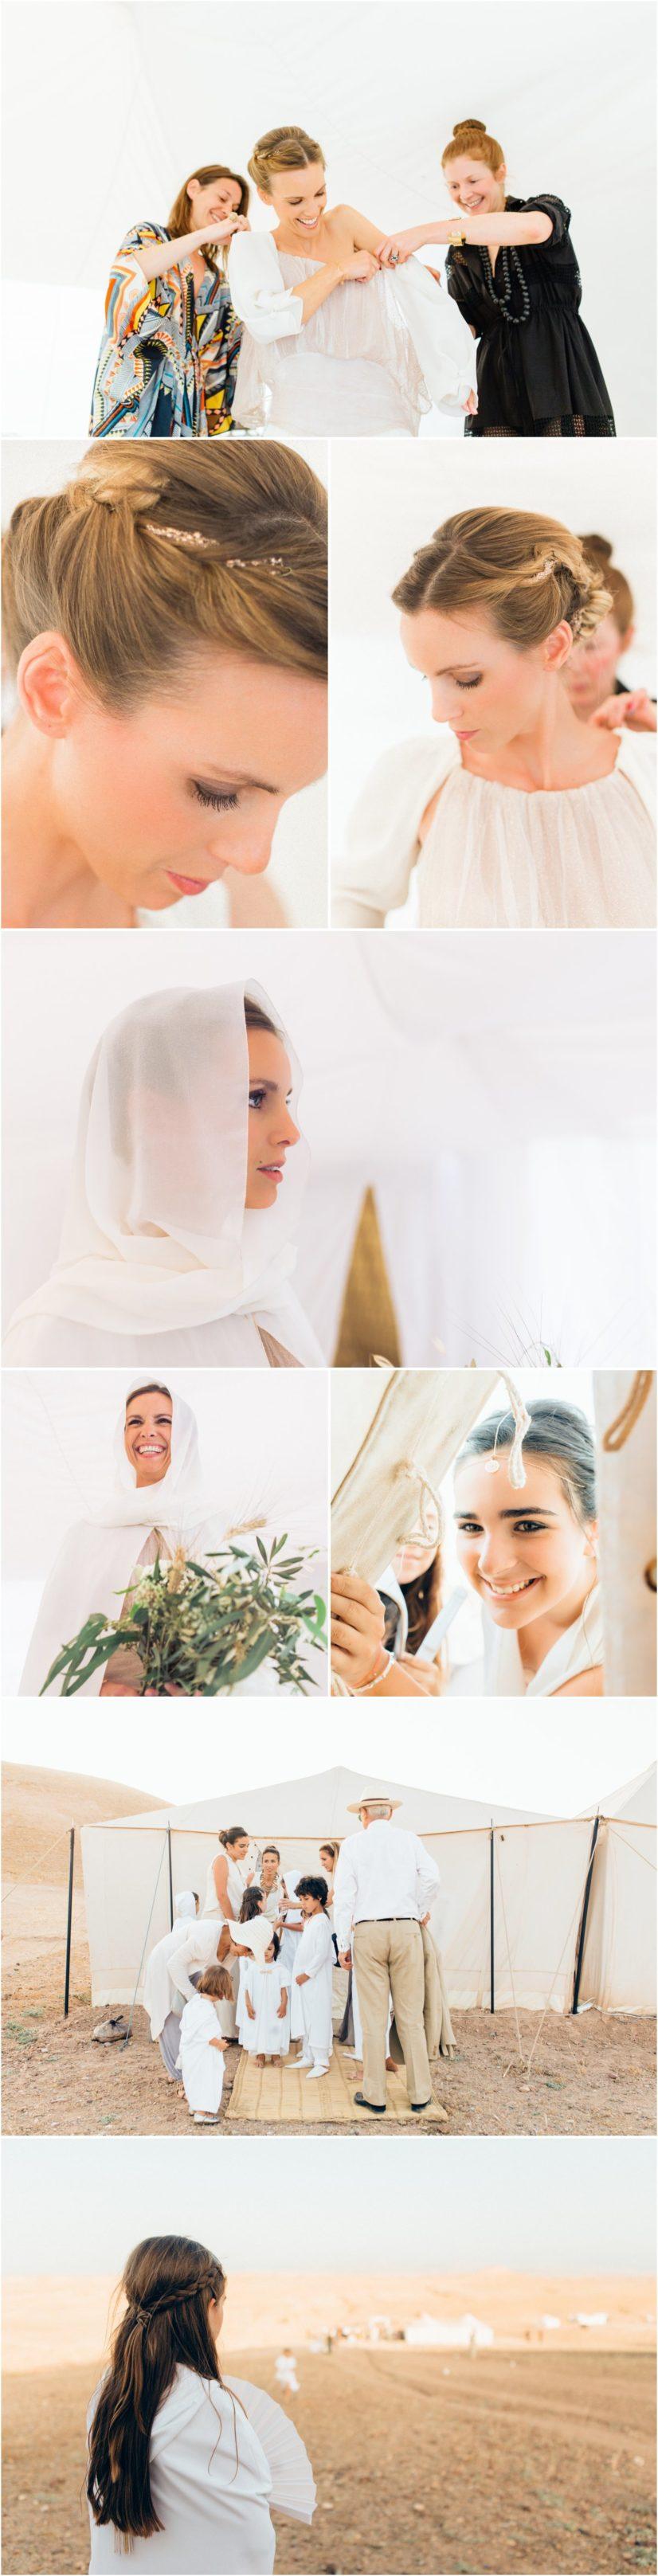 videaste mariage Marrakech 9